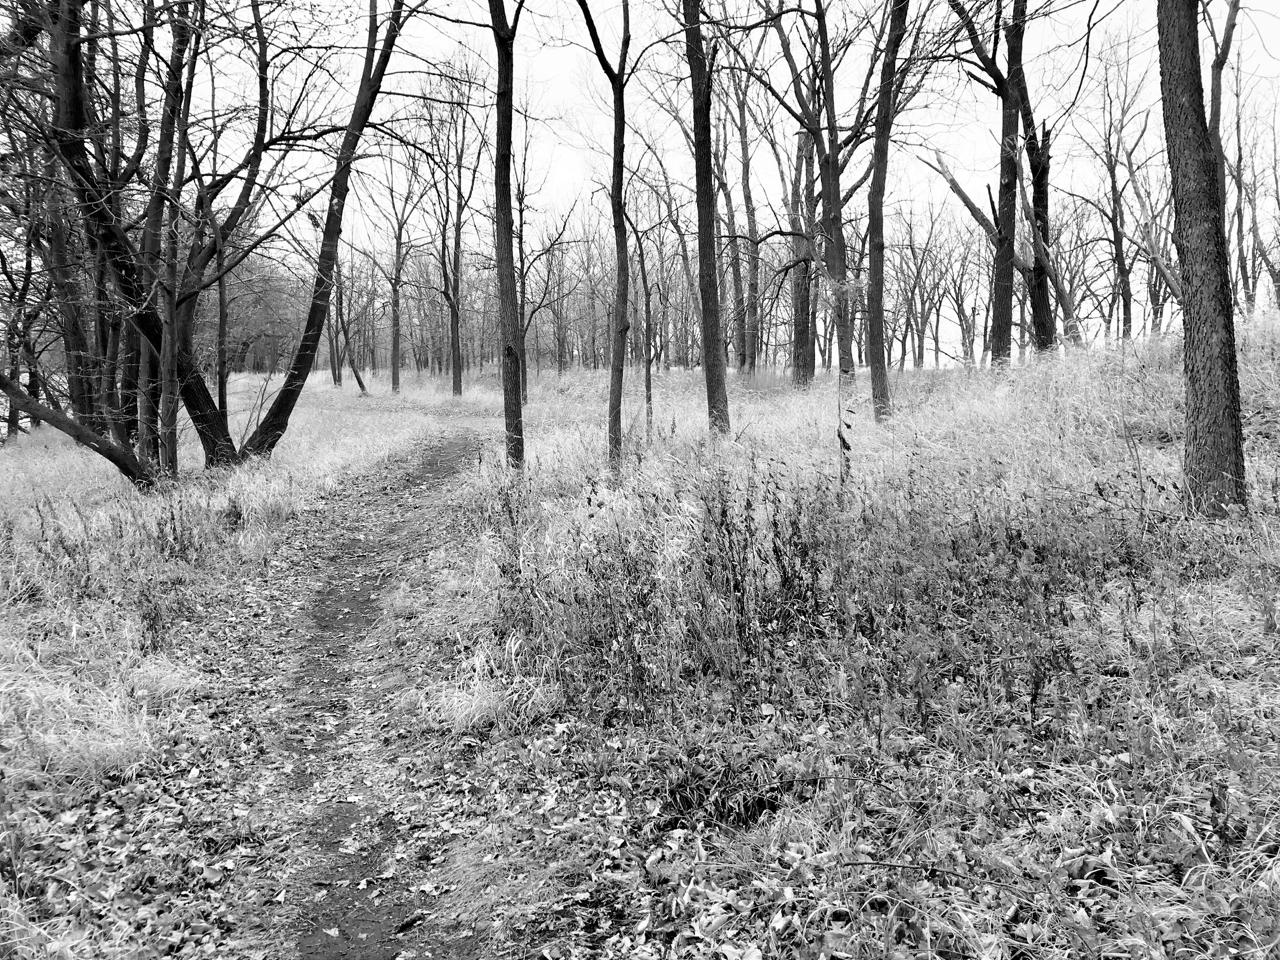 Fall Grass. Lake Farm Park. Madison, Wisconsin. December 2017. © William D. Walker